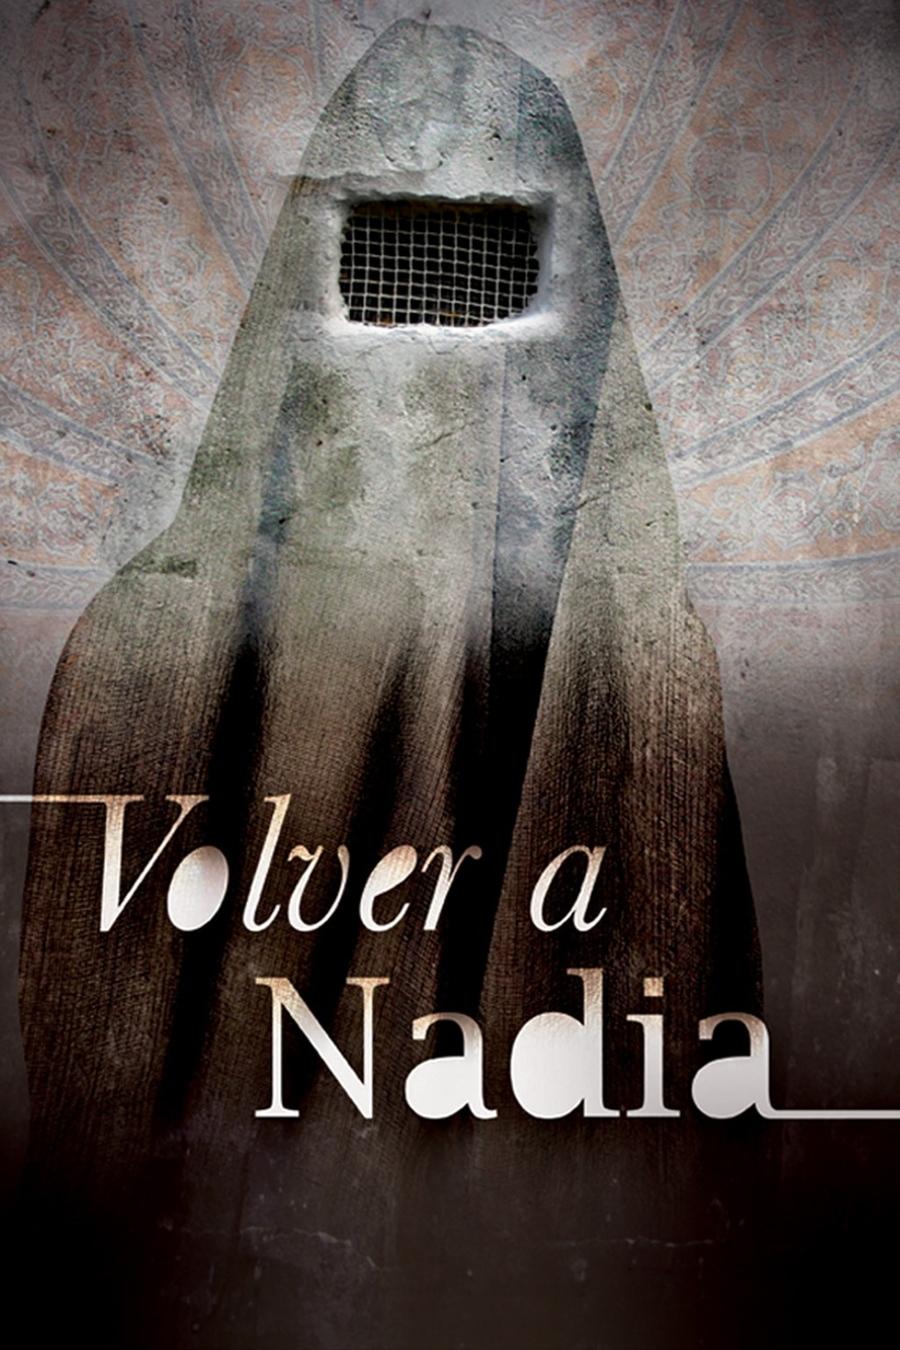 Volver a Nadia